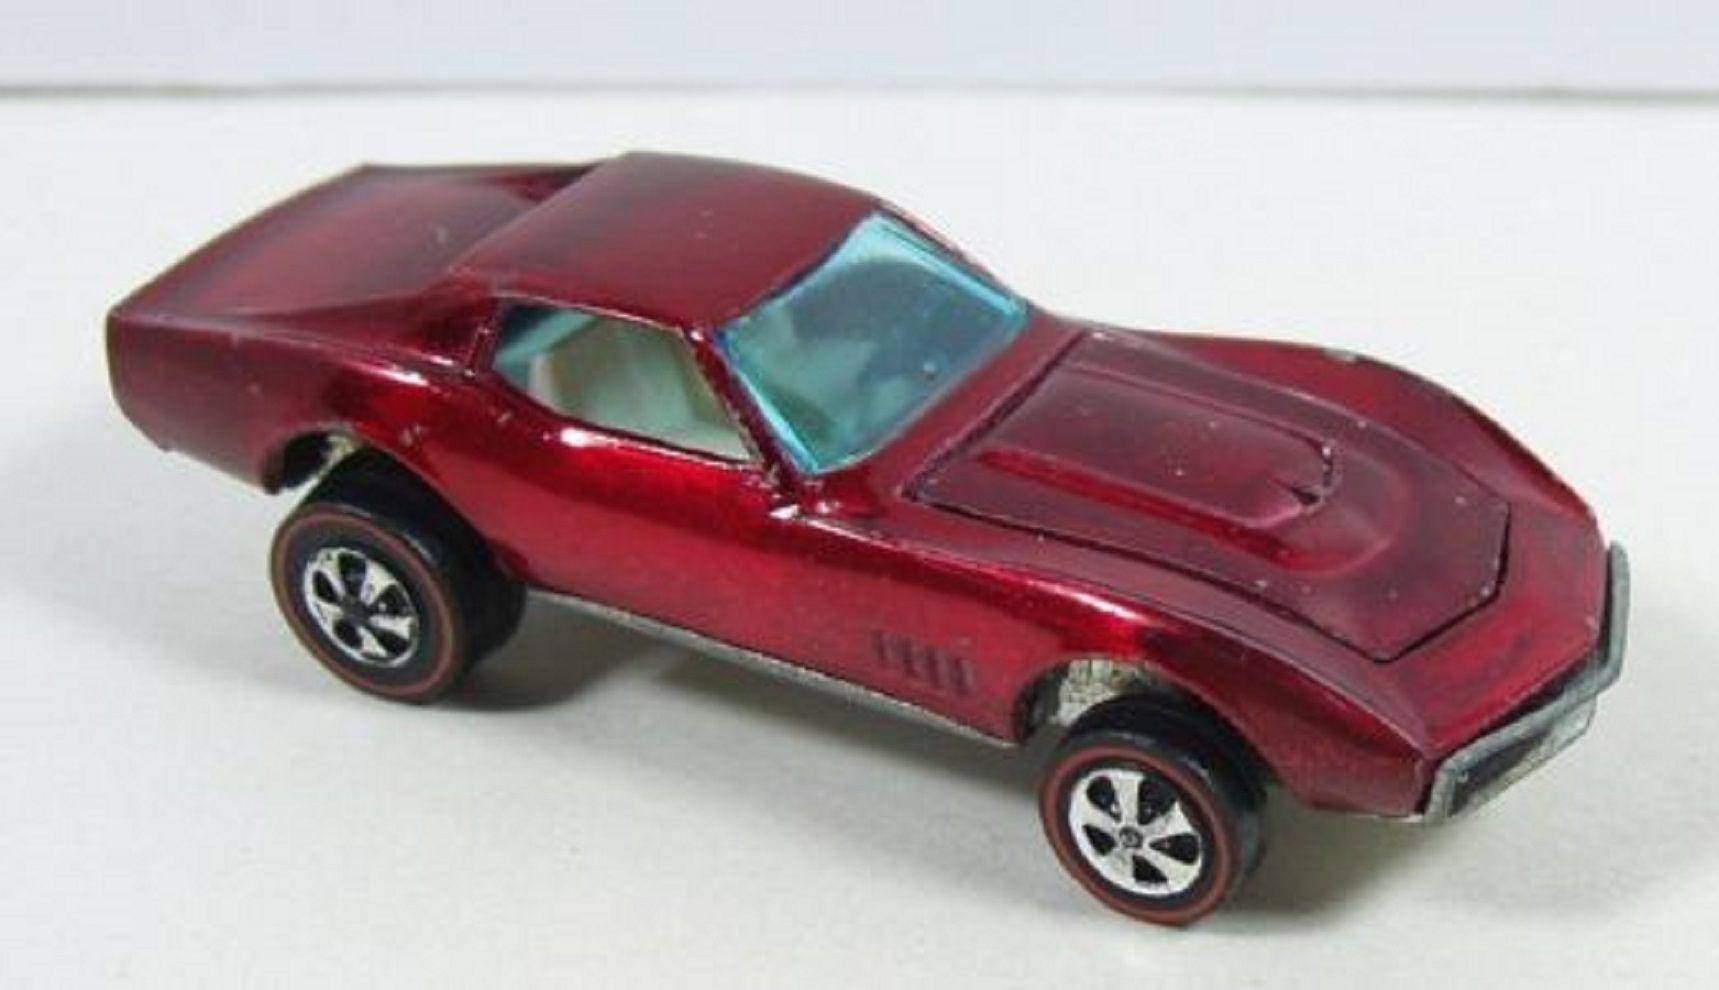 Hot Wheels In 2021 Hot Wheels Miniature Cars Corvette [ 990 x 1719 Pixel ]